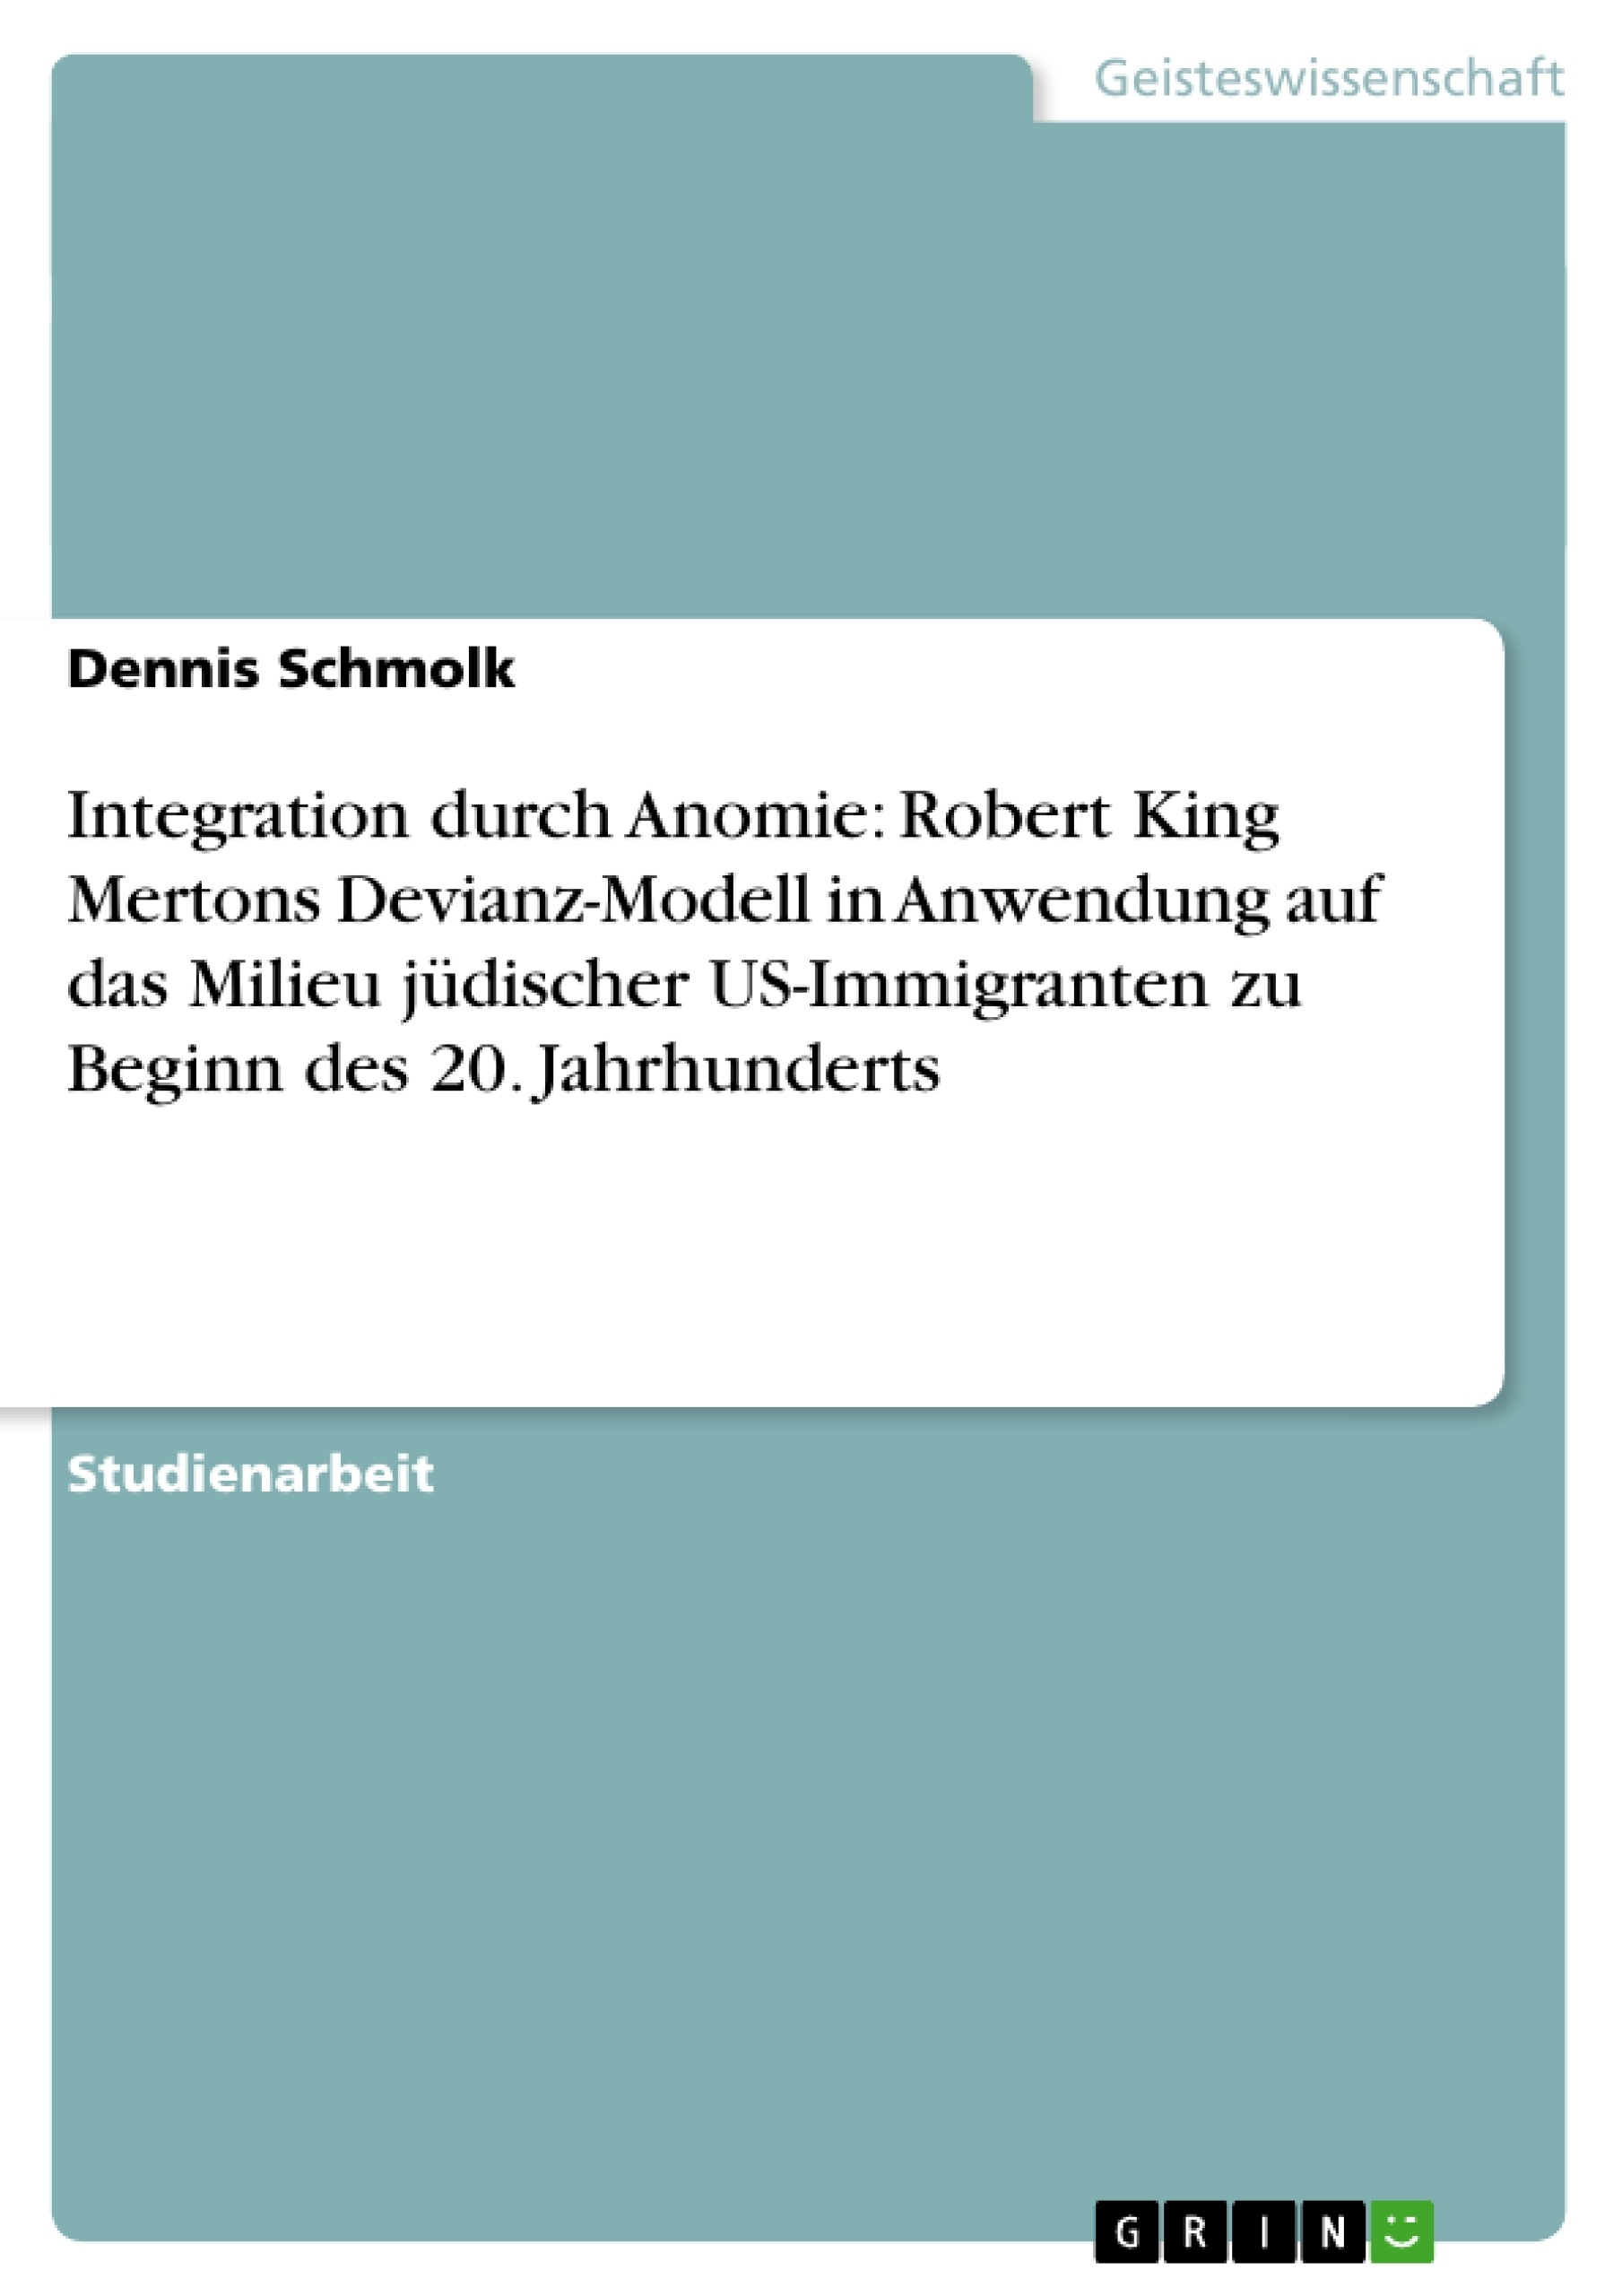 Titel: Integration durch Anomie: Robert King Mertons Devianz-Modell in Anwendung auf das Milieu jüdischer US-Immigranten zu Beginn des 20. Jahrhunderts